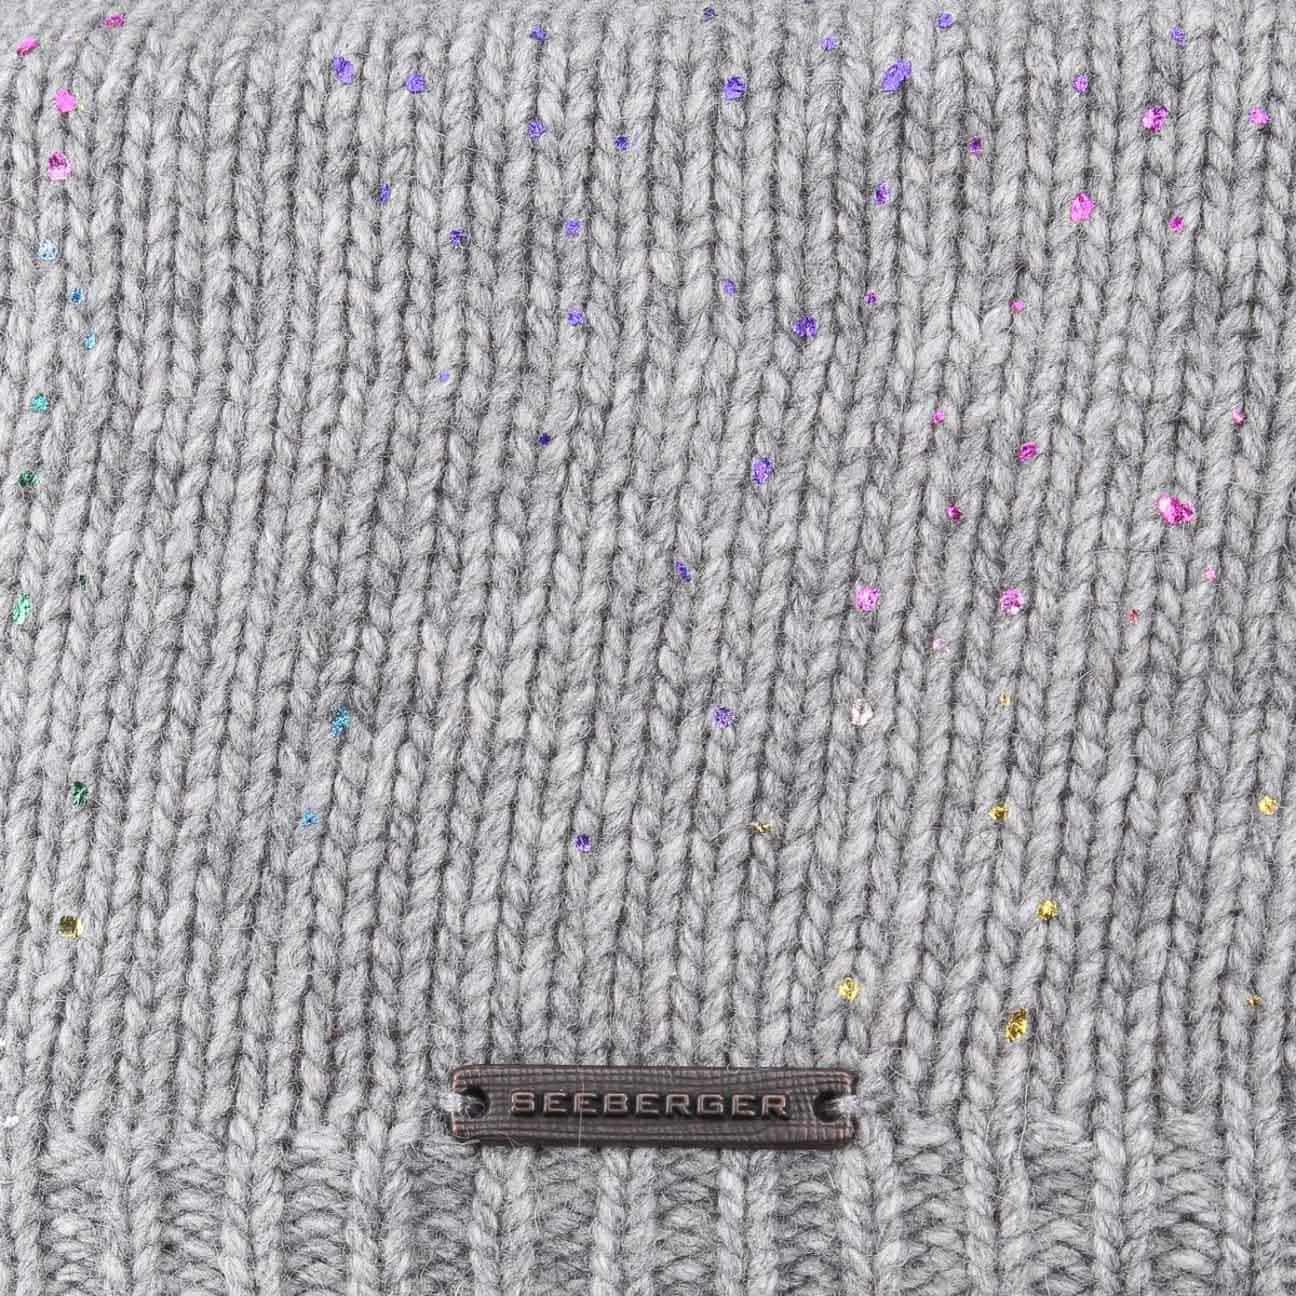 56b5c70795f ... Allover Rainbow Print Beanie by Seeberger - light grey 3 ...